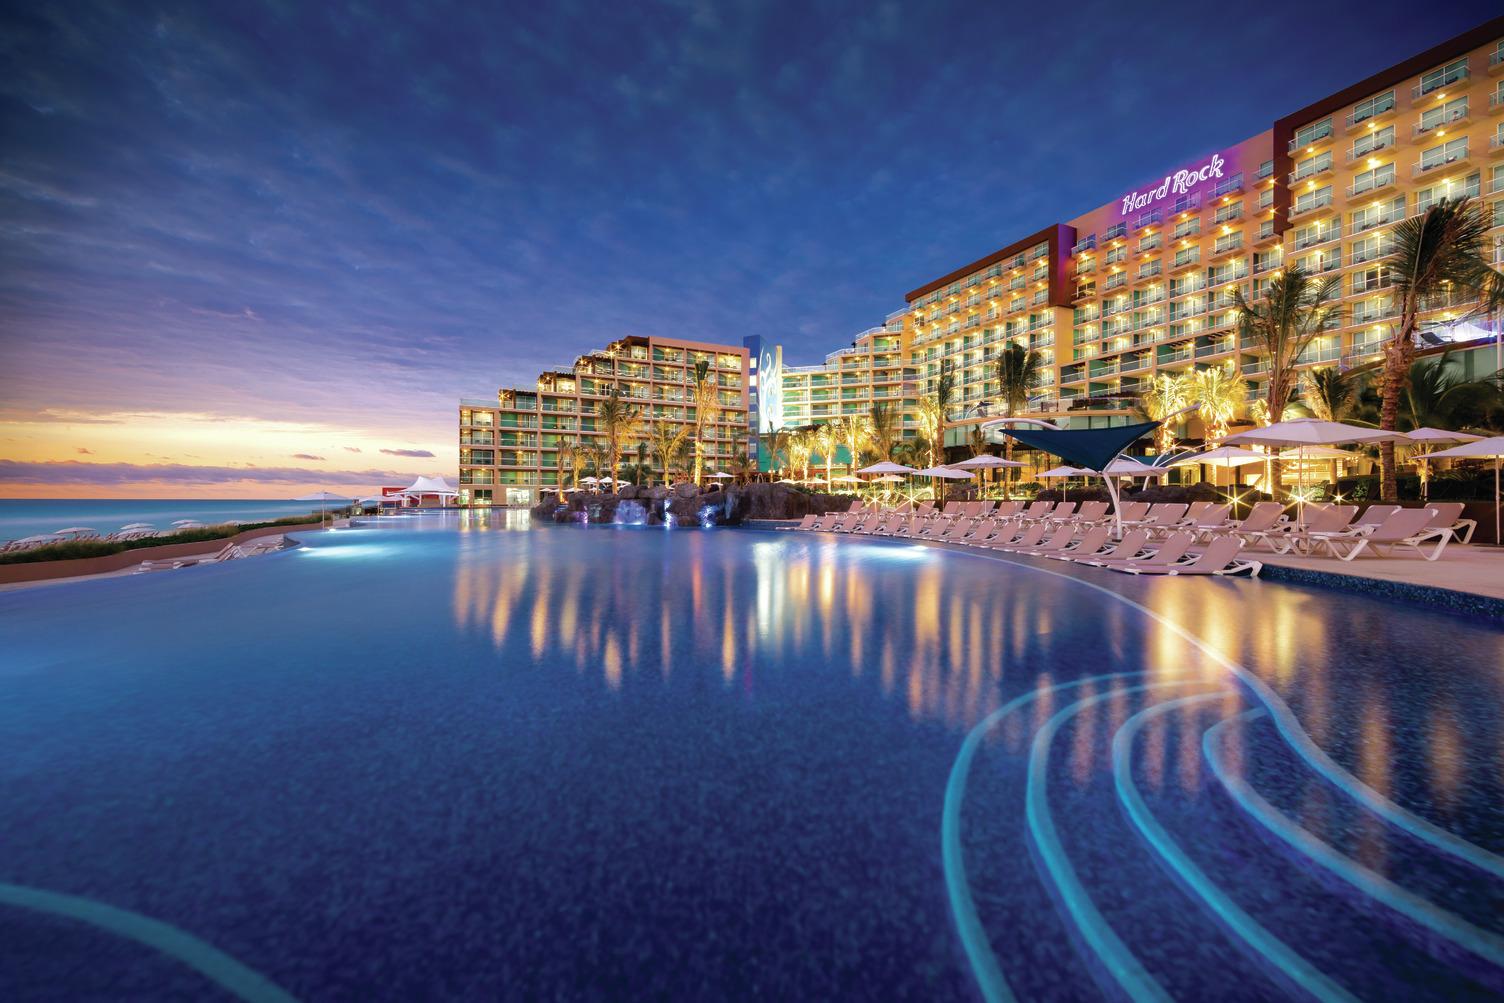 HRH Cancun Pool_Dusk.jpg